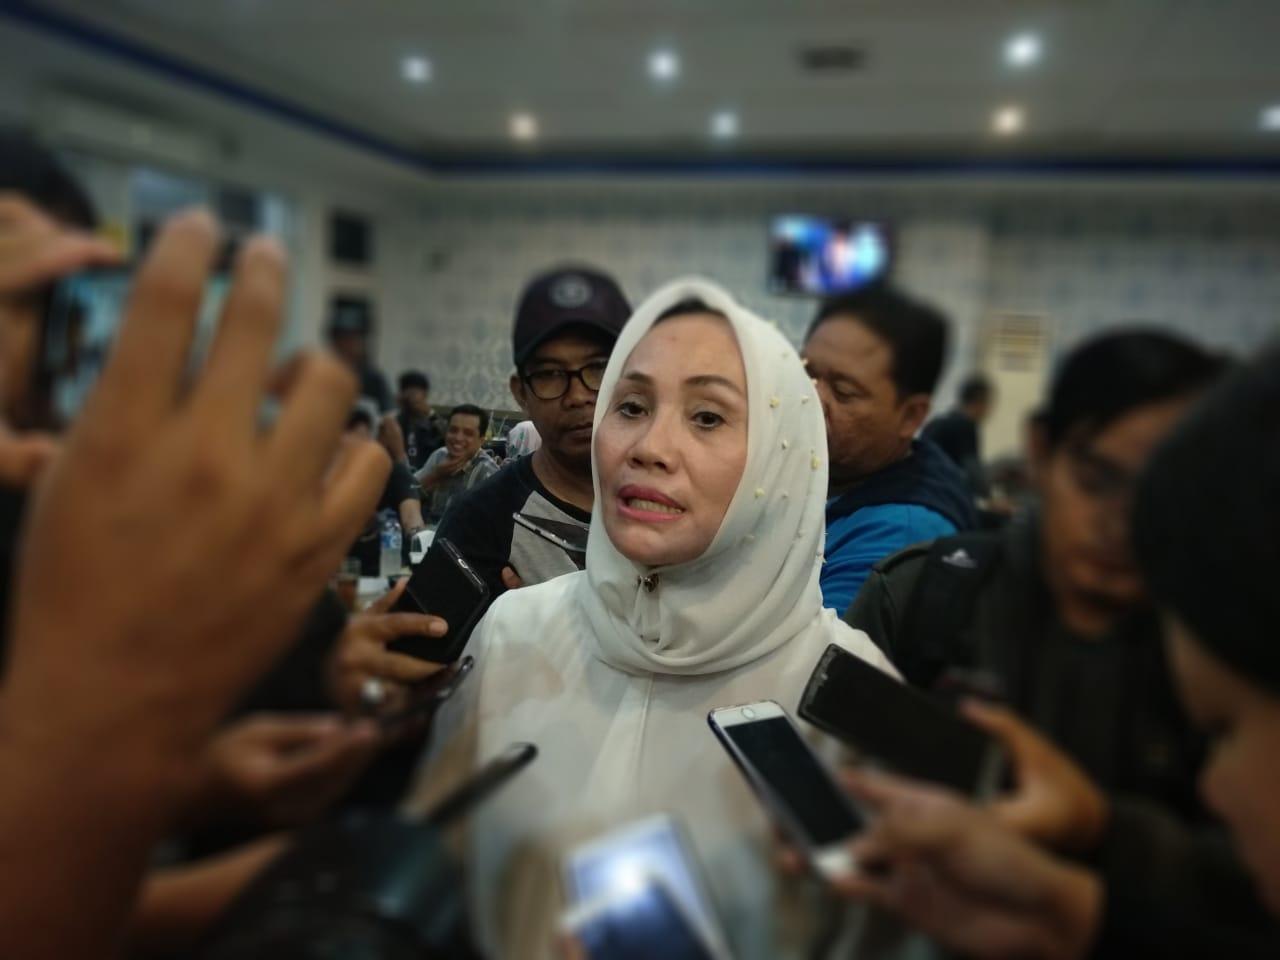 Eti Herawati, Wakil Calon Walikota Cirebon yang berpasangan dengan Azis saat dimintai keterangan kondusifitas Pilkada. Foto: Alwi